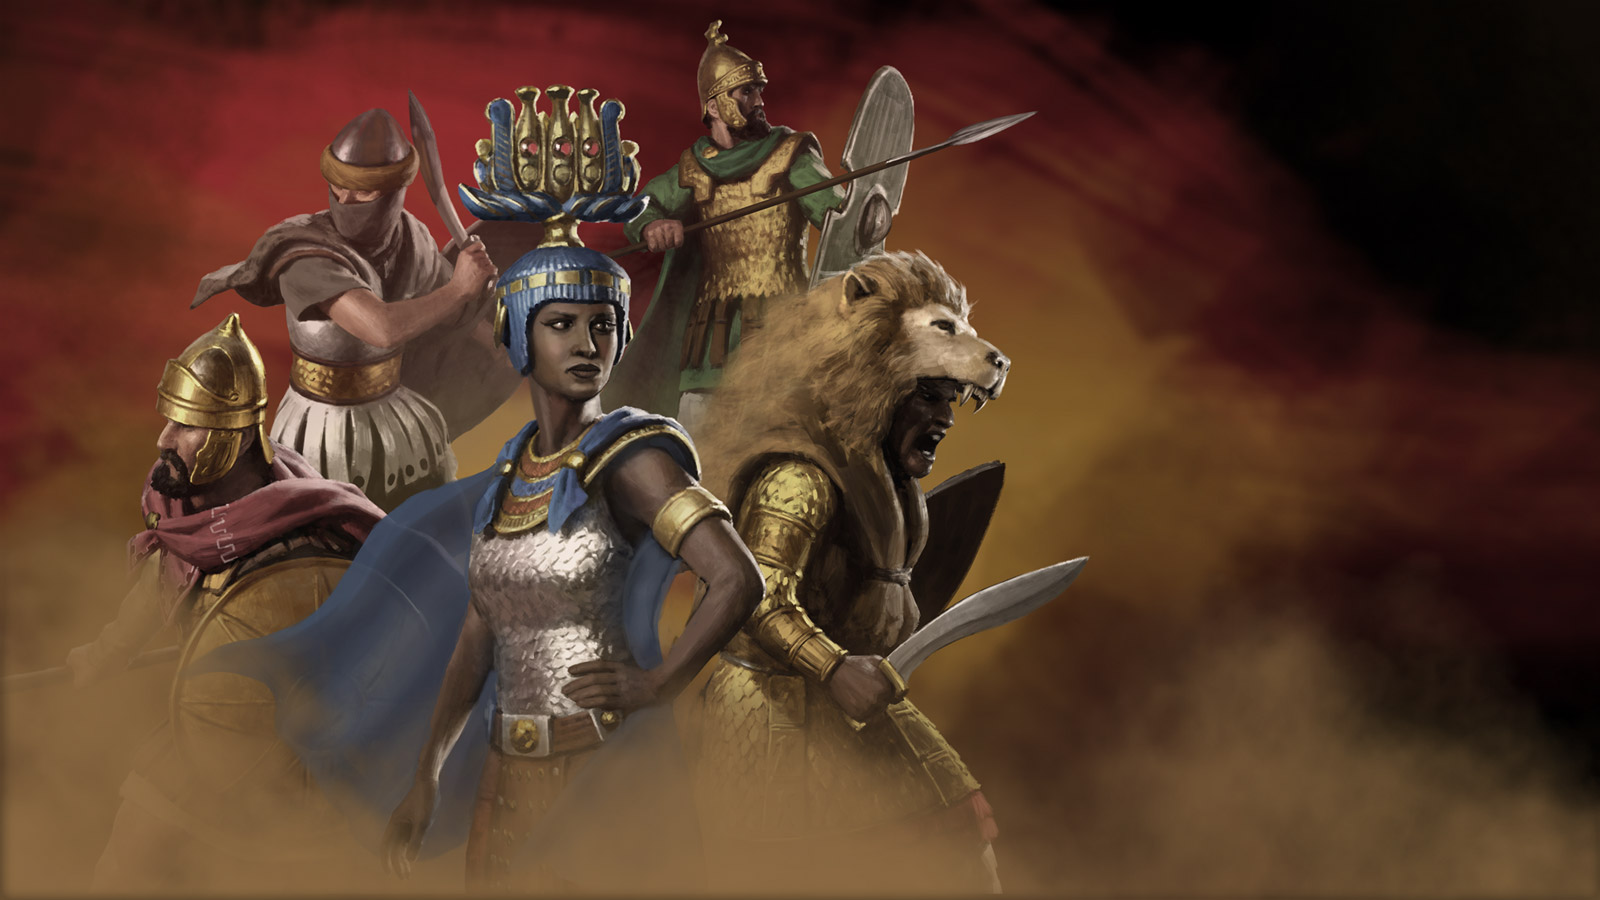 Free Total War: Rome II Wallpaper in 1600x900